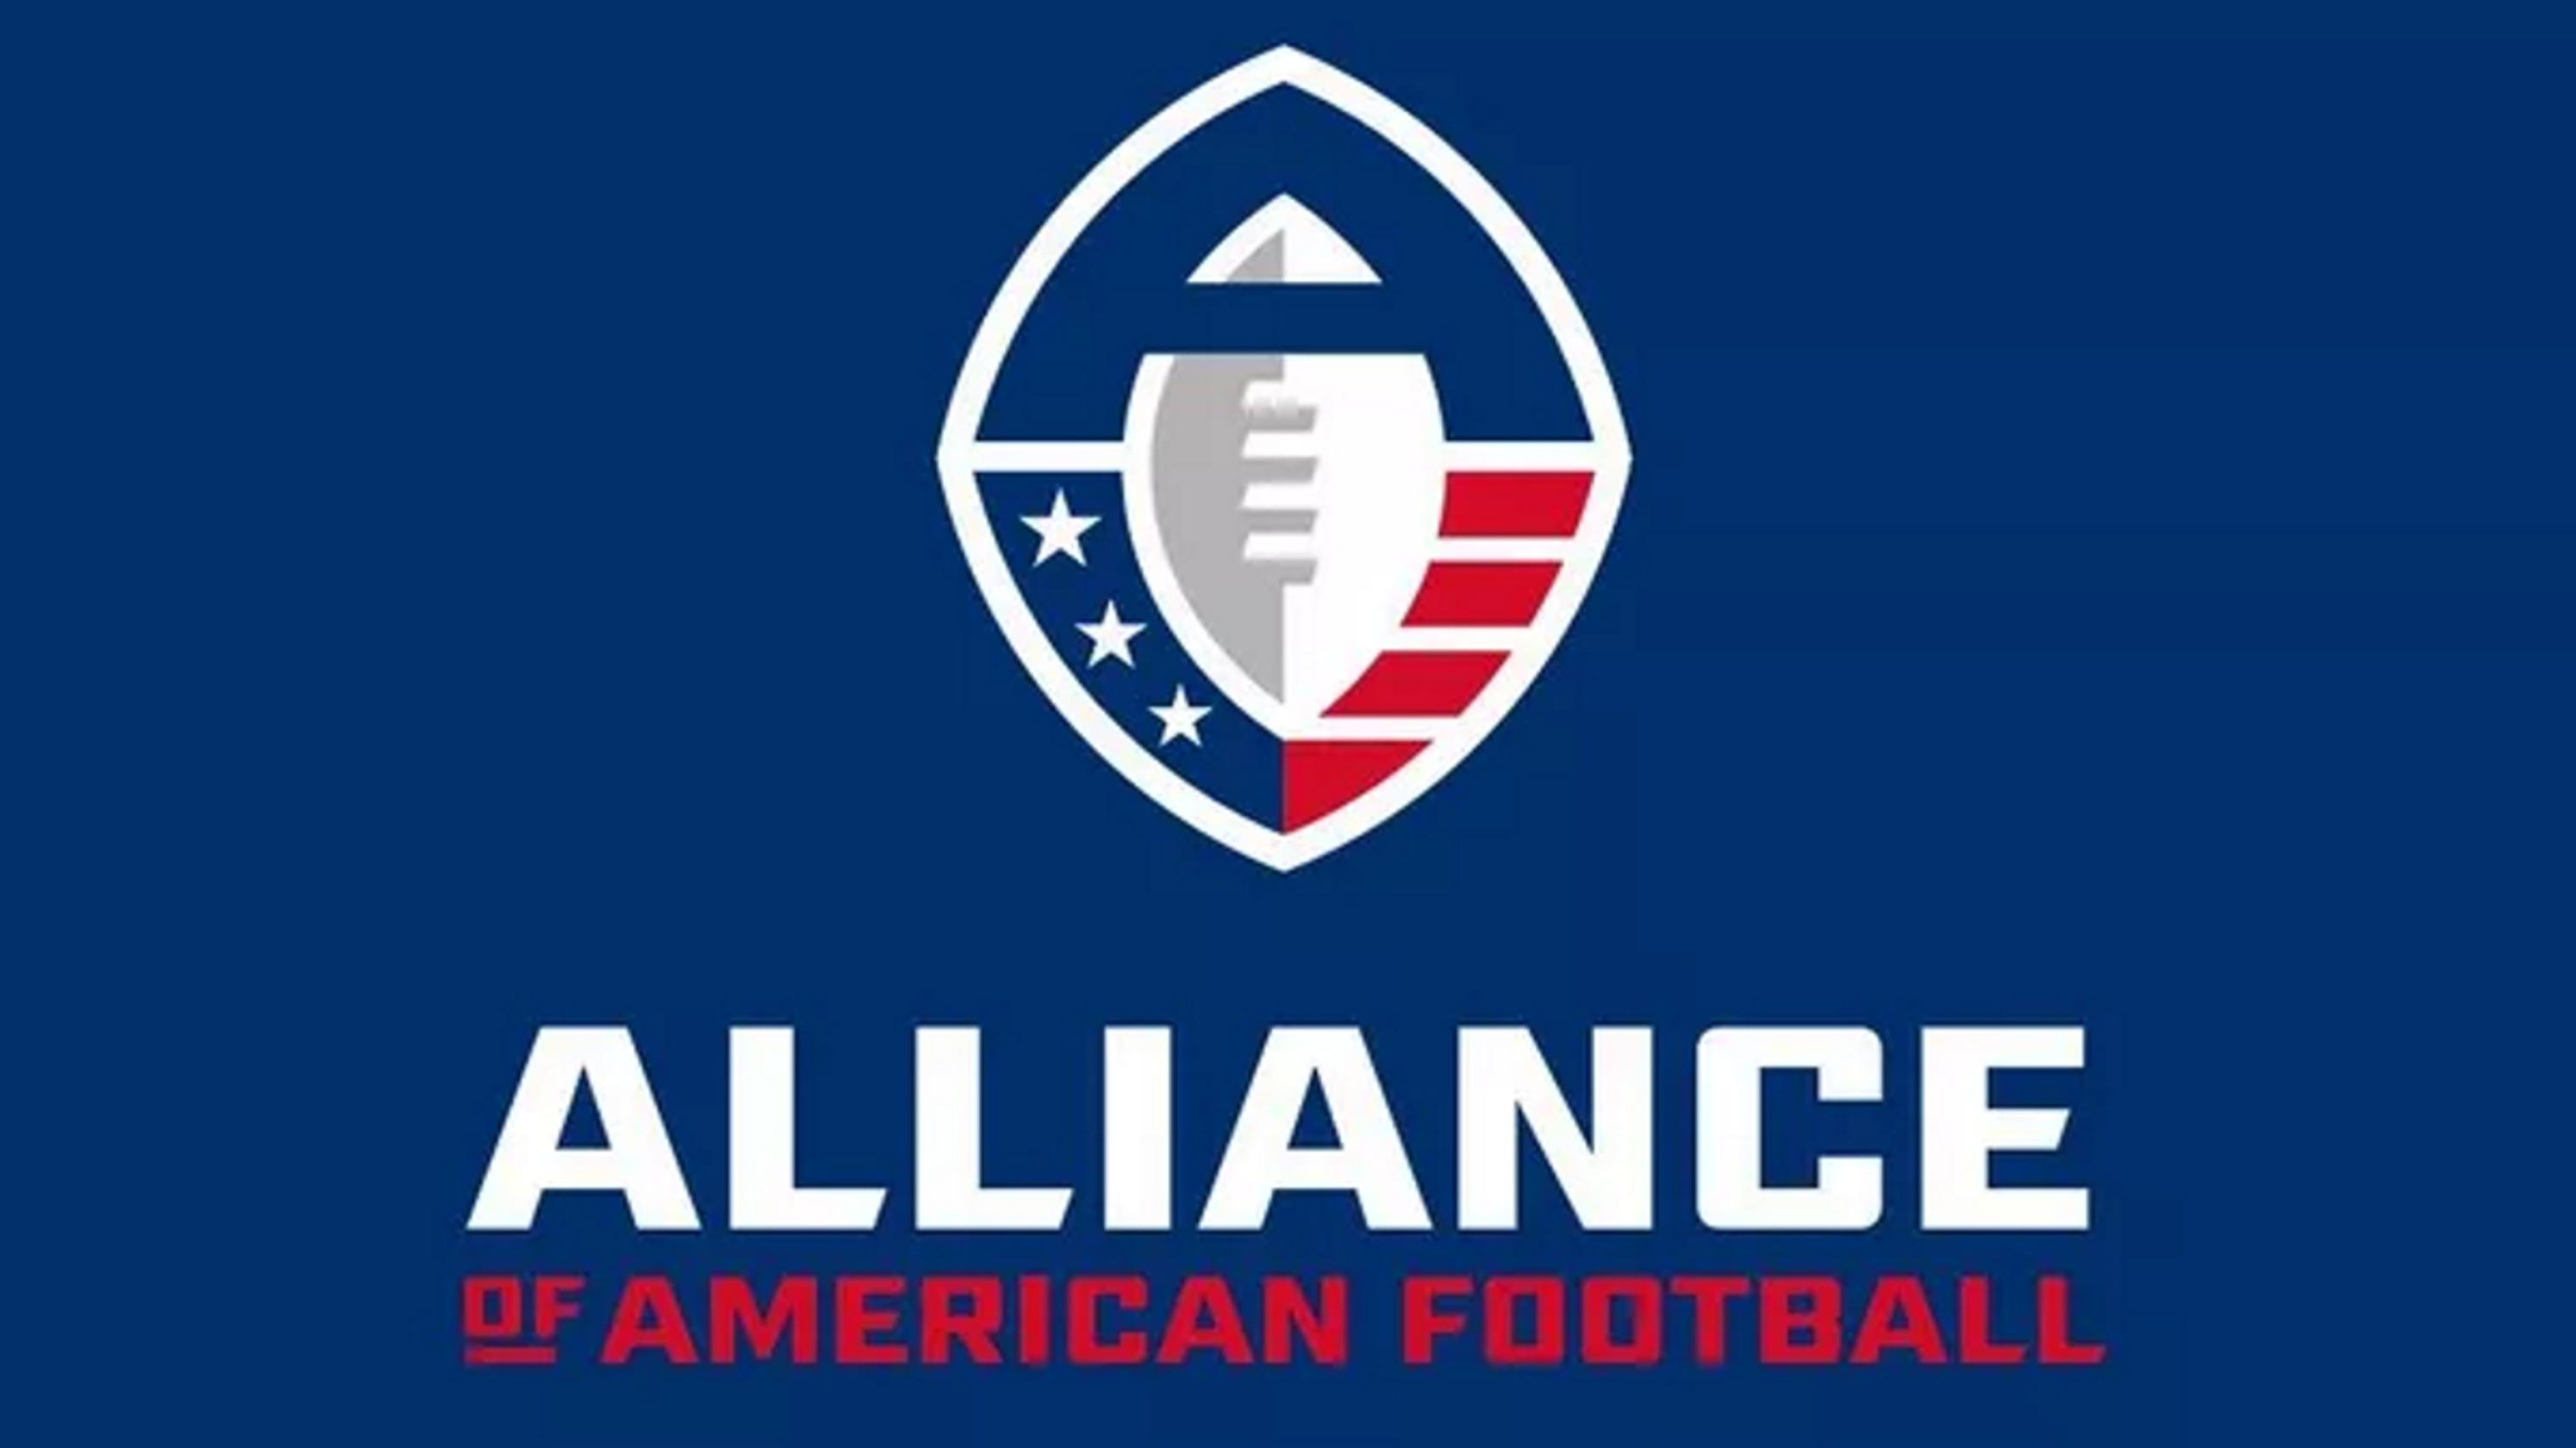 AAF: New pro football league, the Alliance of American Football, kicks off Saturday